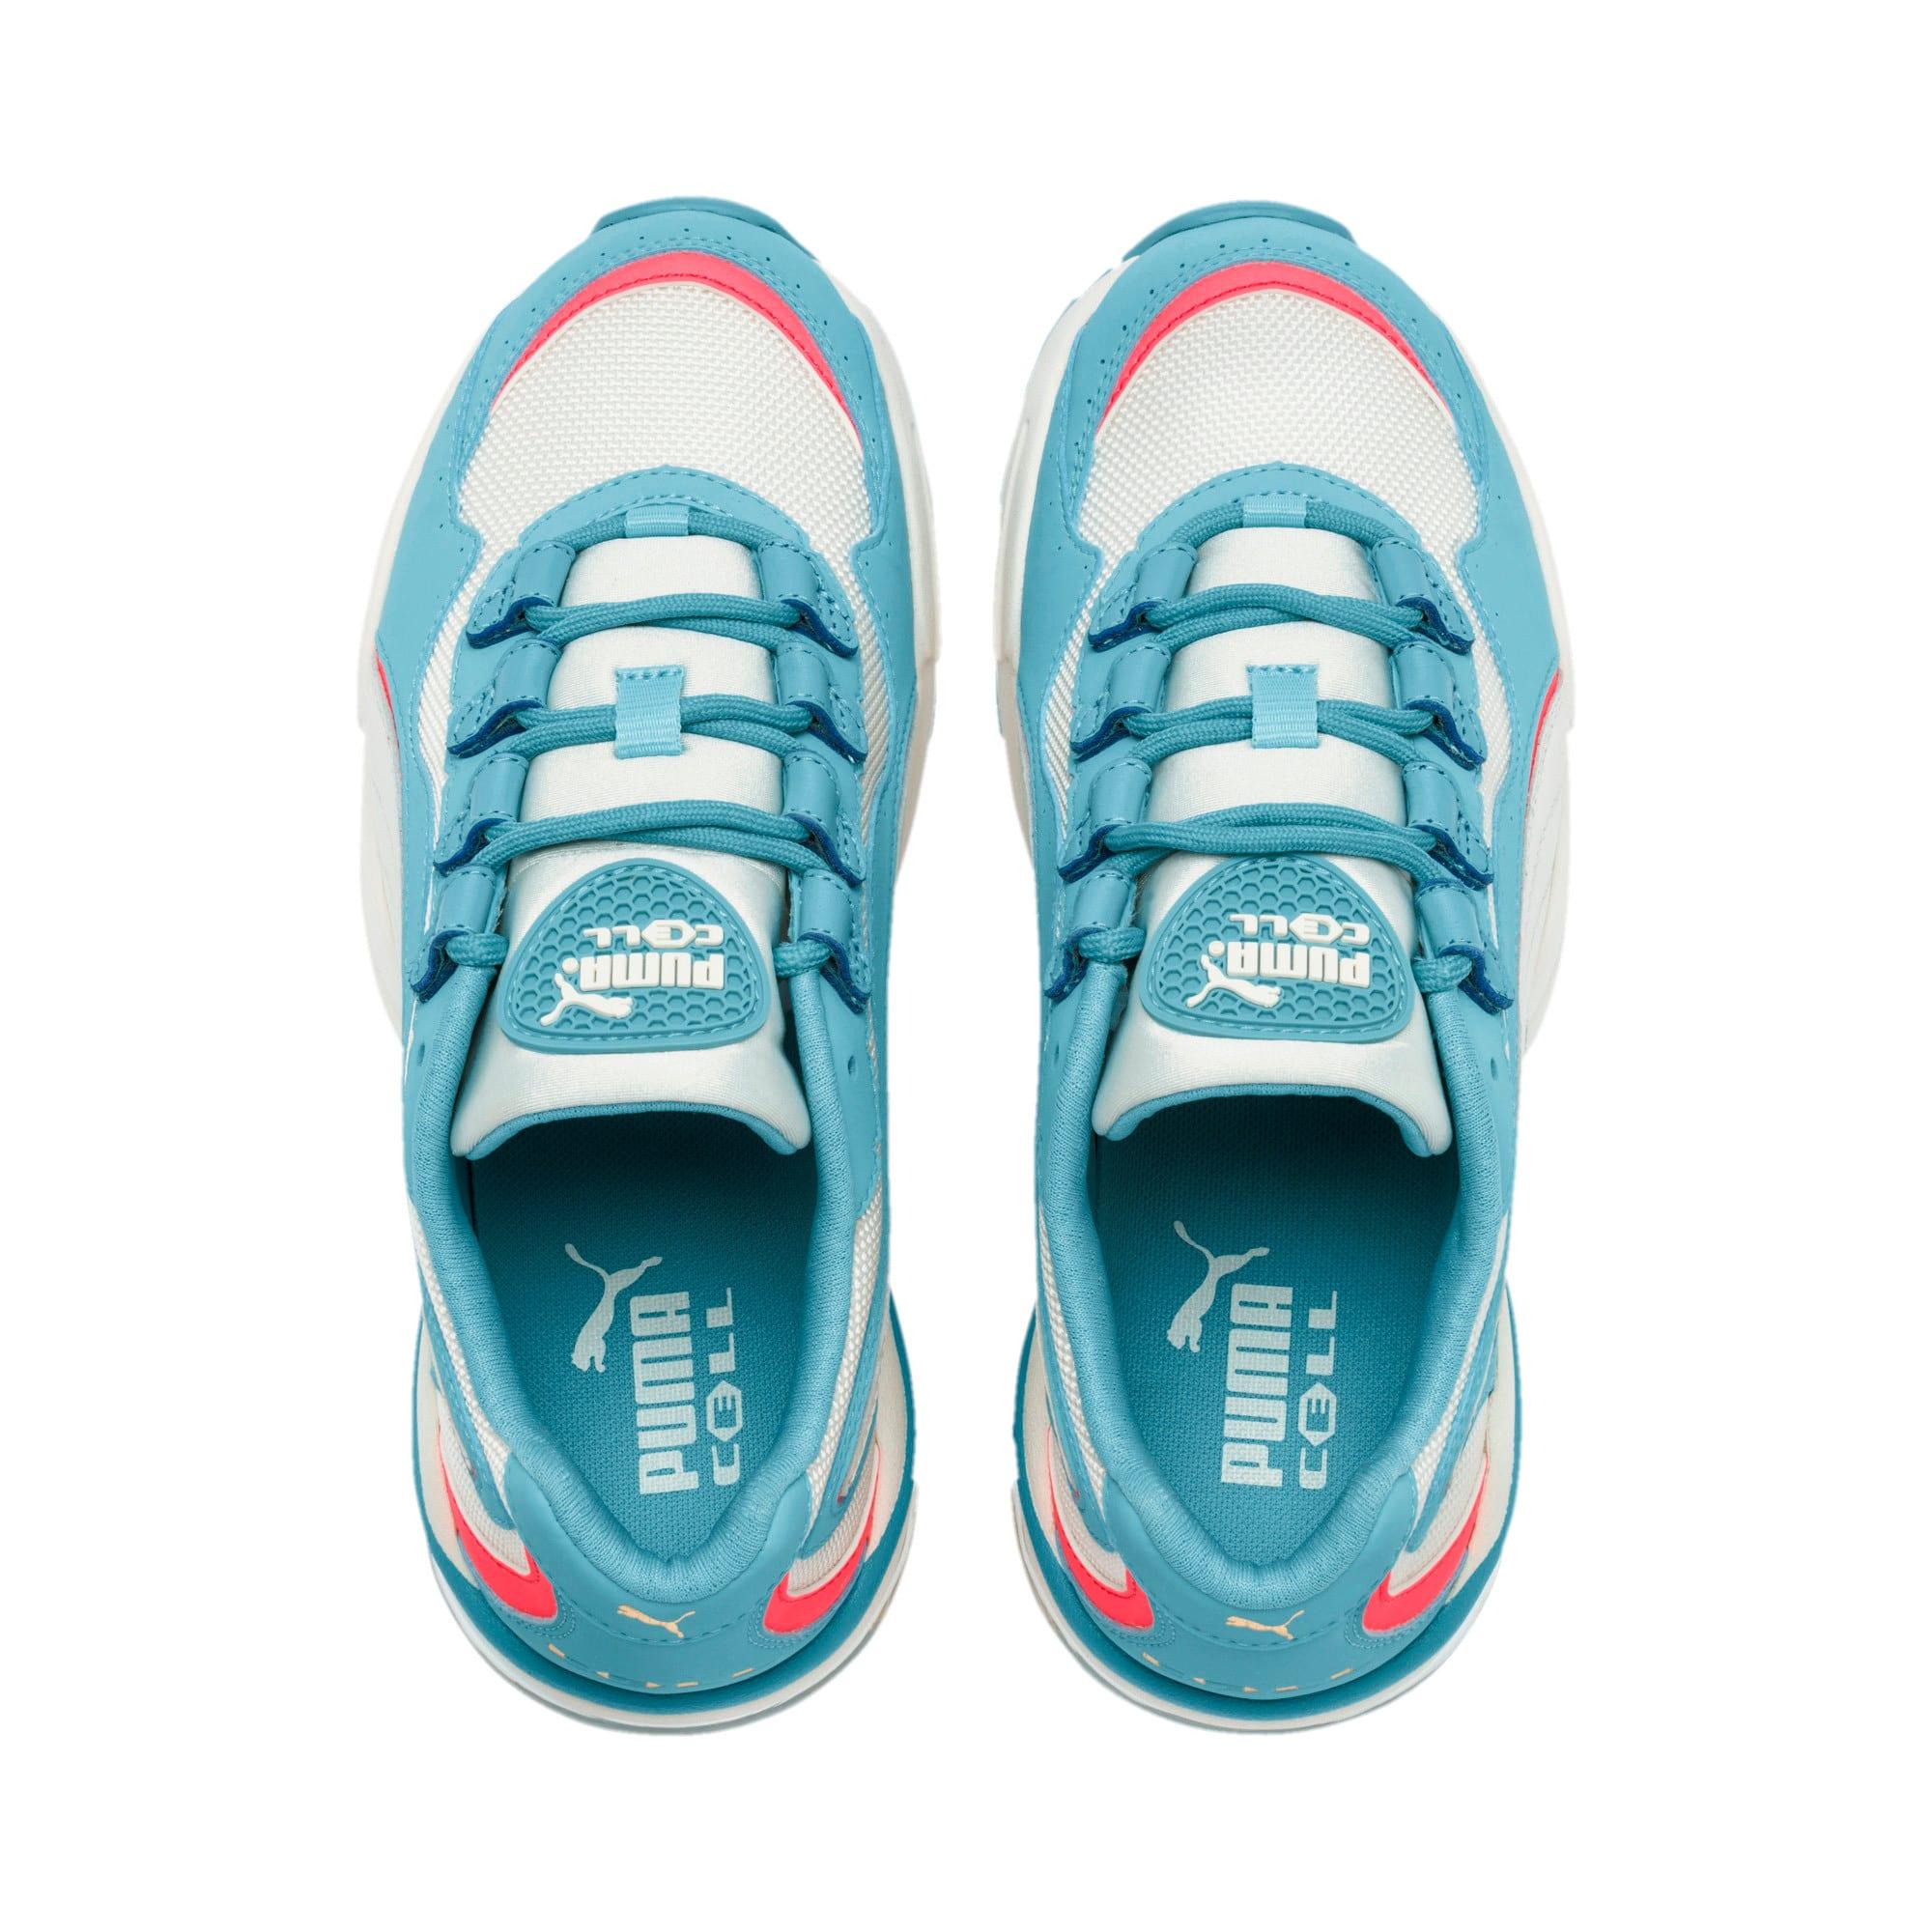 Miniatura 7 de Zapatos deportivos CELL Stellar para mujer, Milky Blue-Puma Team Gold, mediano